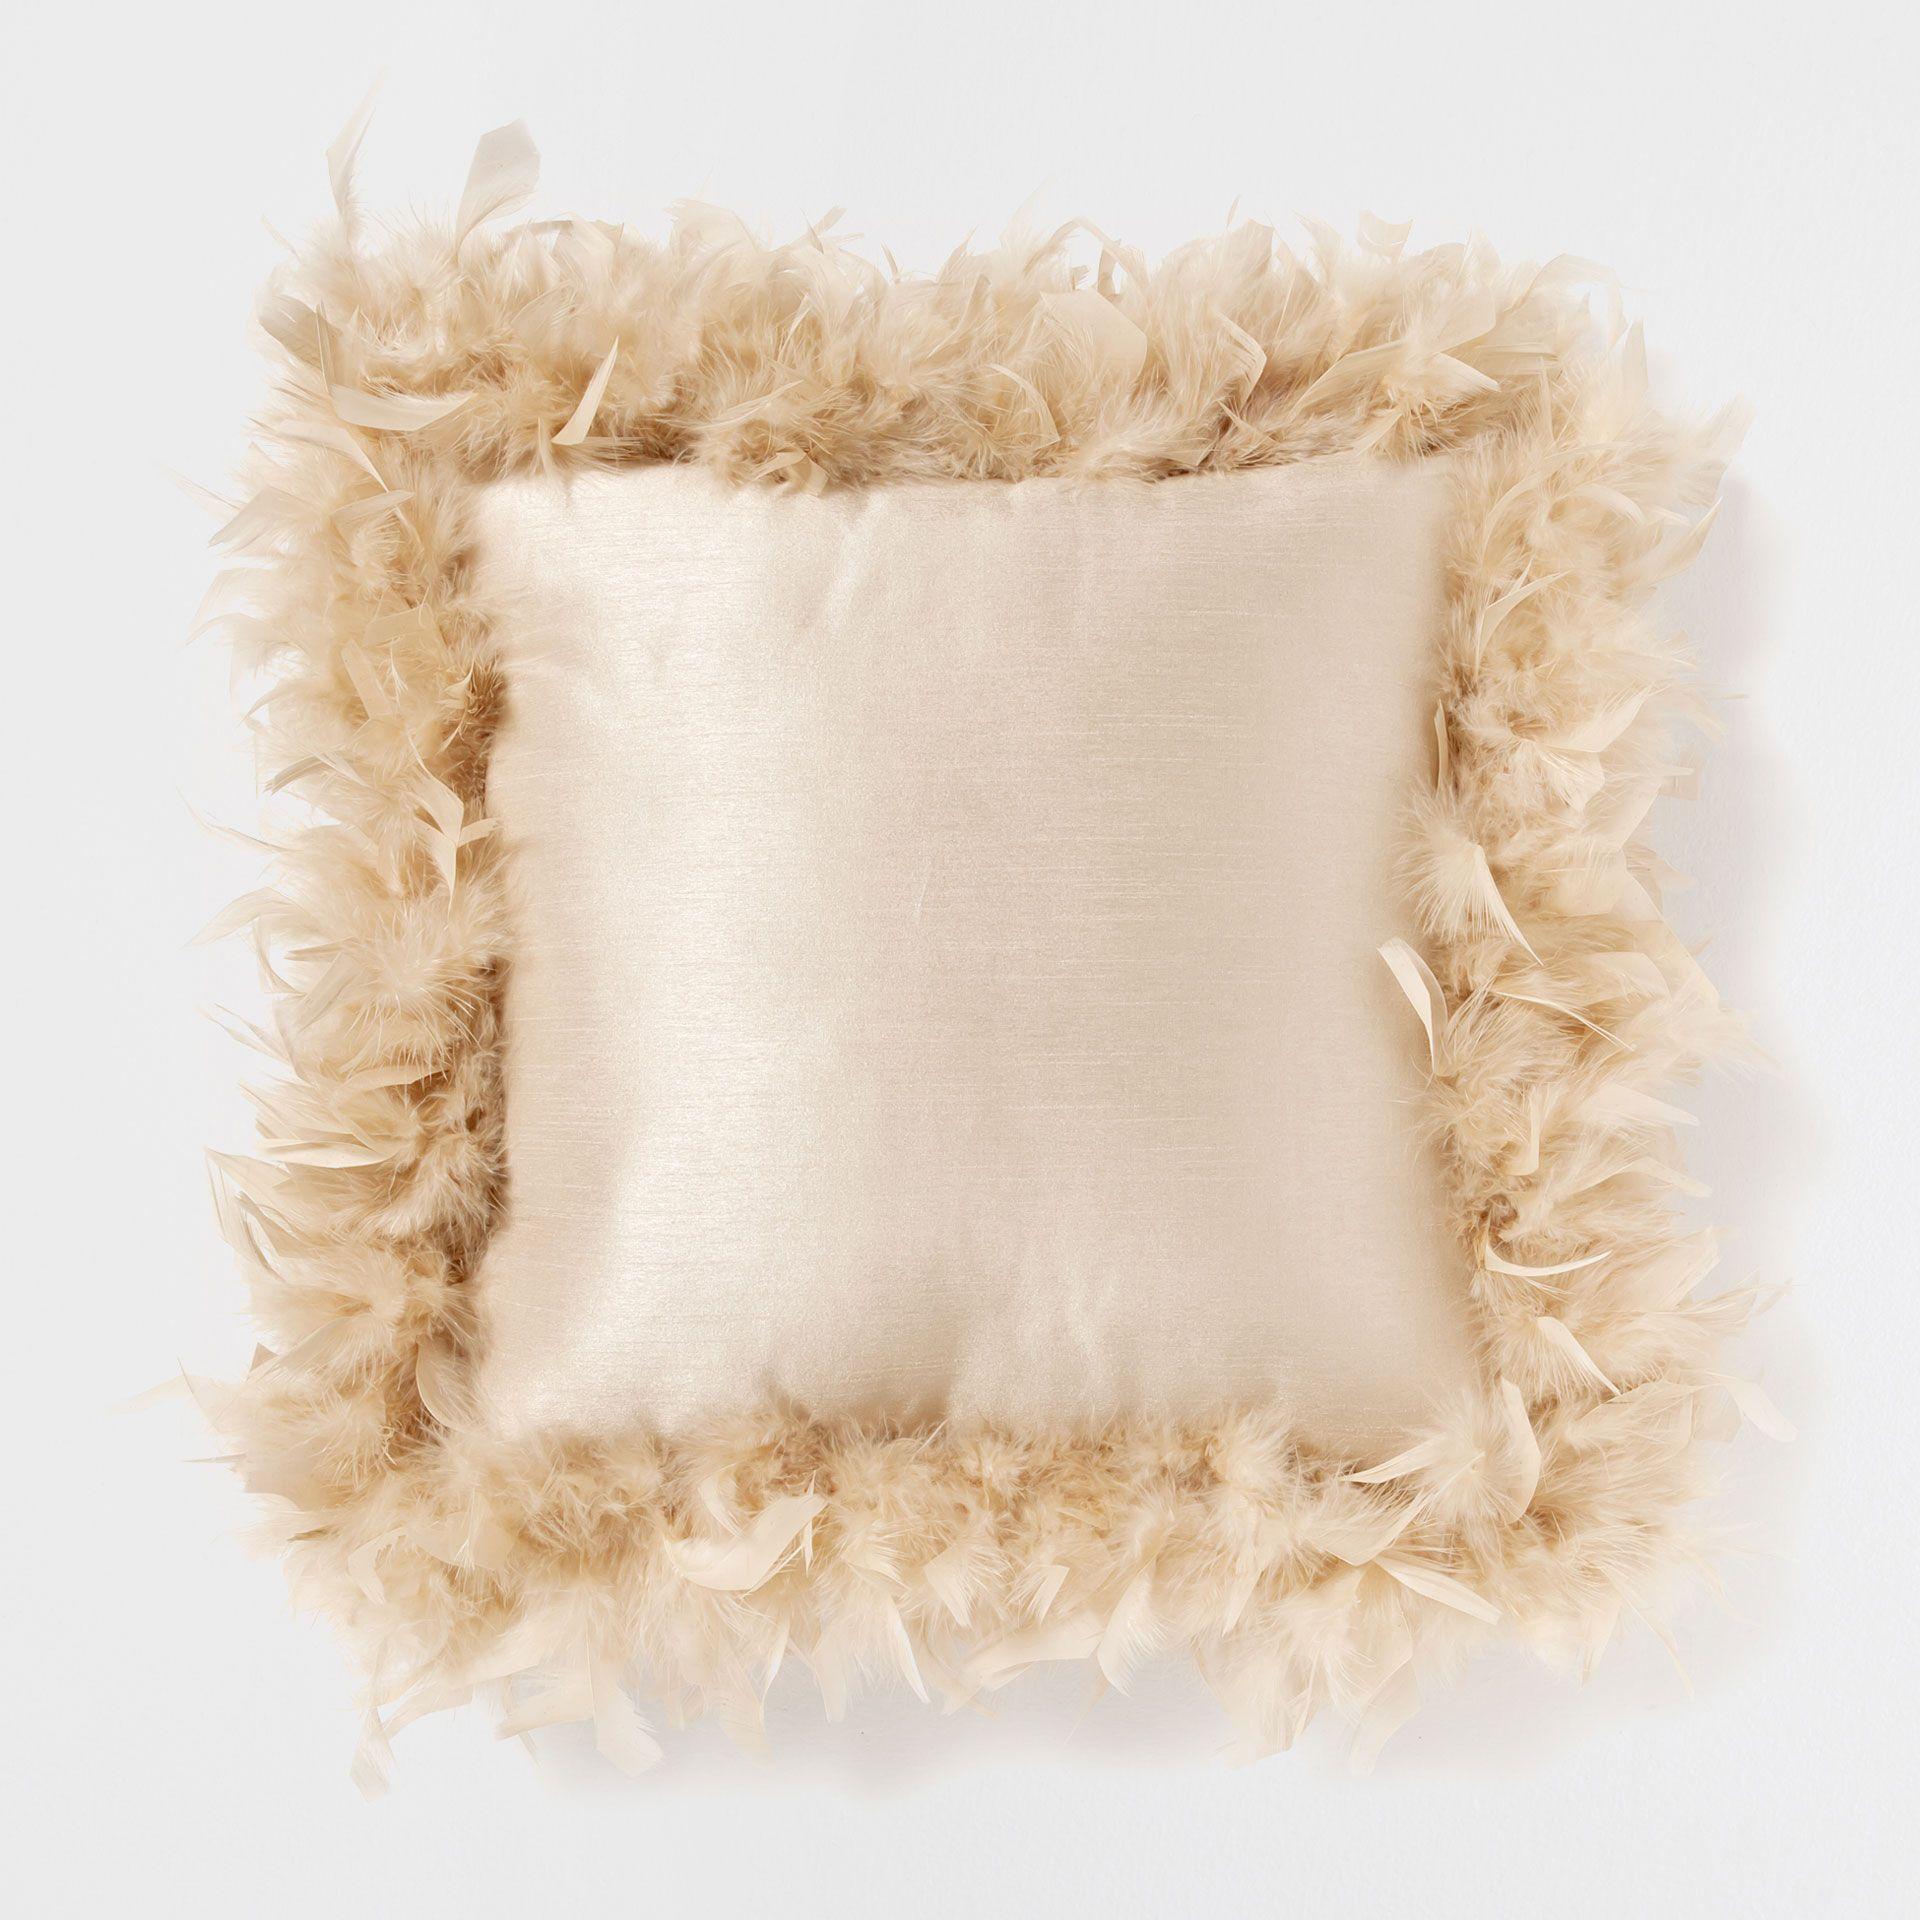 Beige Feather Edge Cushion Cushions Bedroom Zara Home United Kingdom Kirlent Dekorasyon Yastik